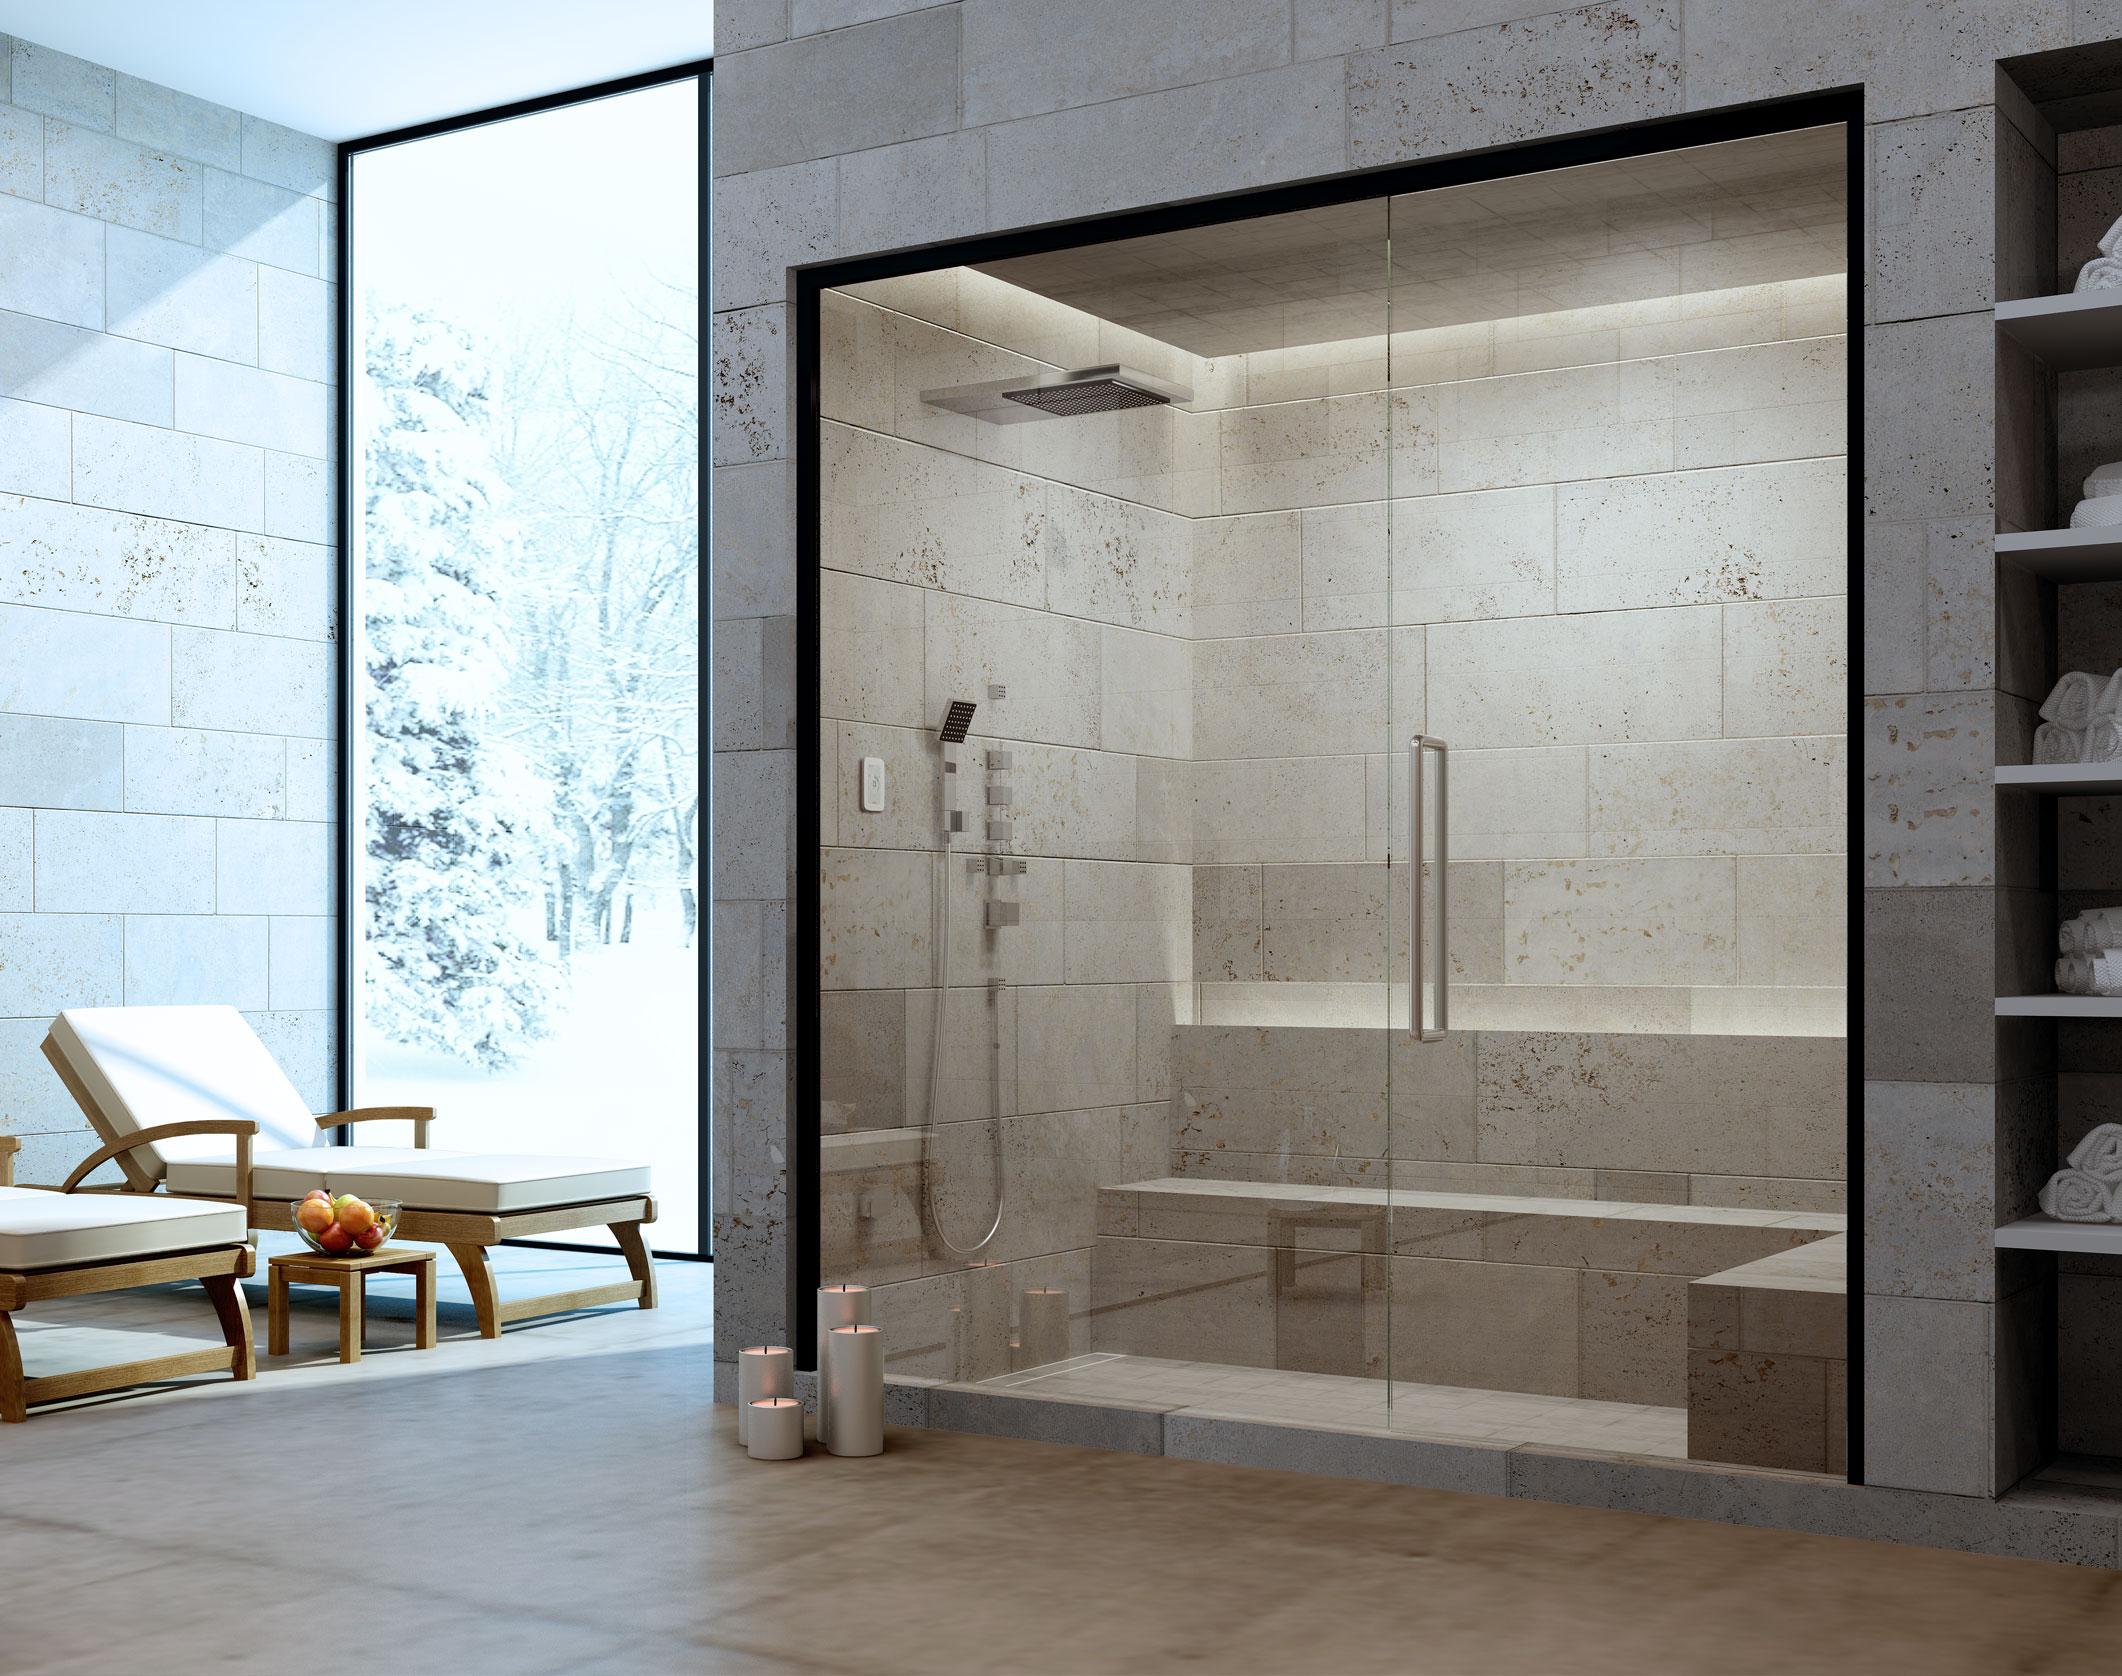 Amerec manufacturing steam sauna since 1963 for Steam room plans